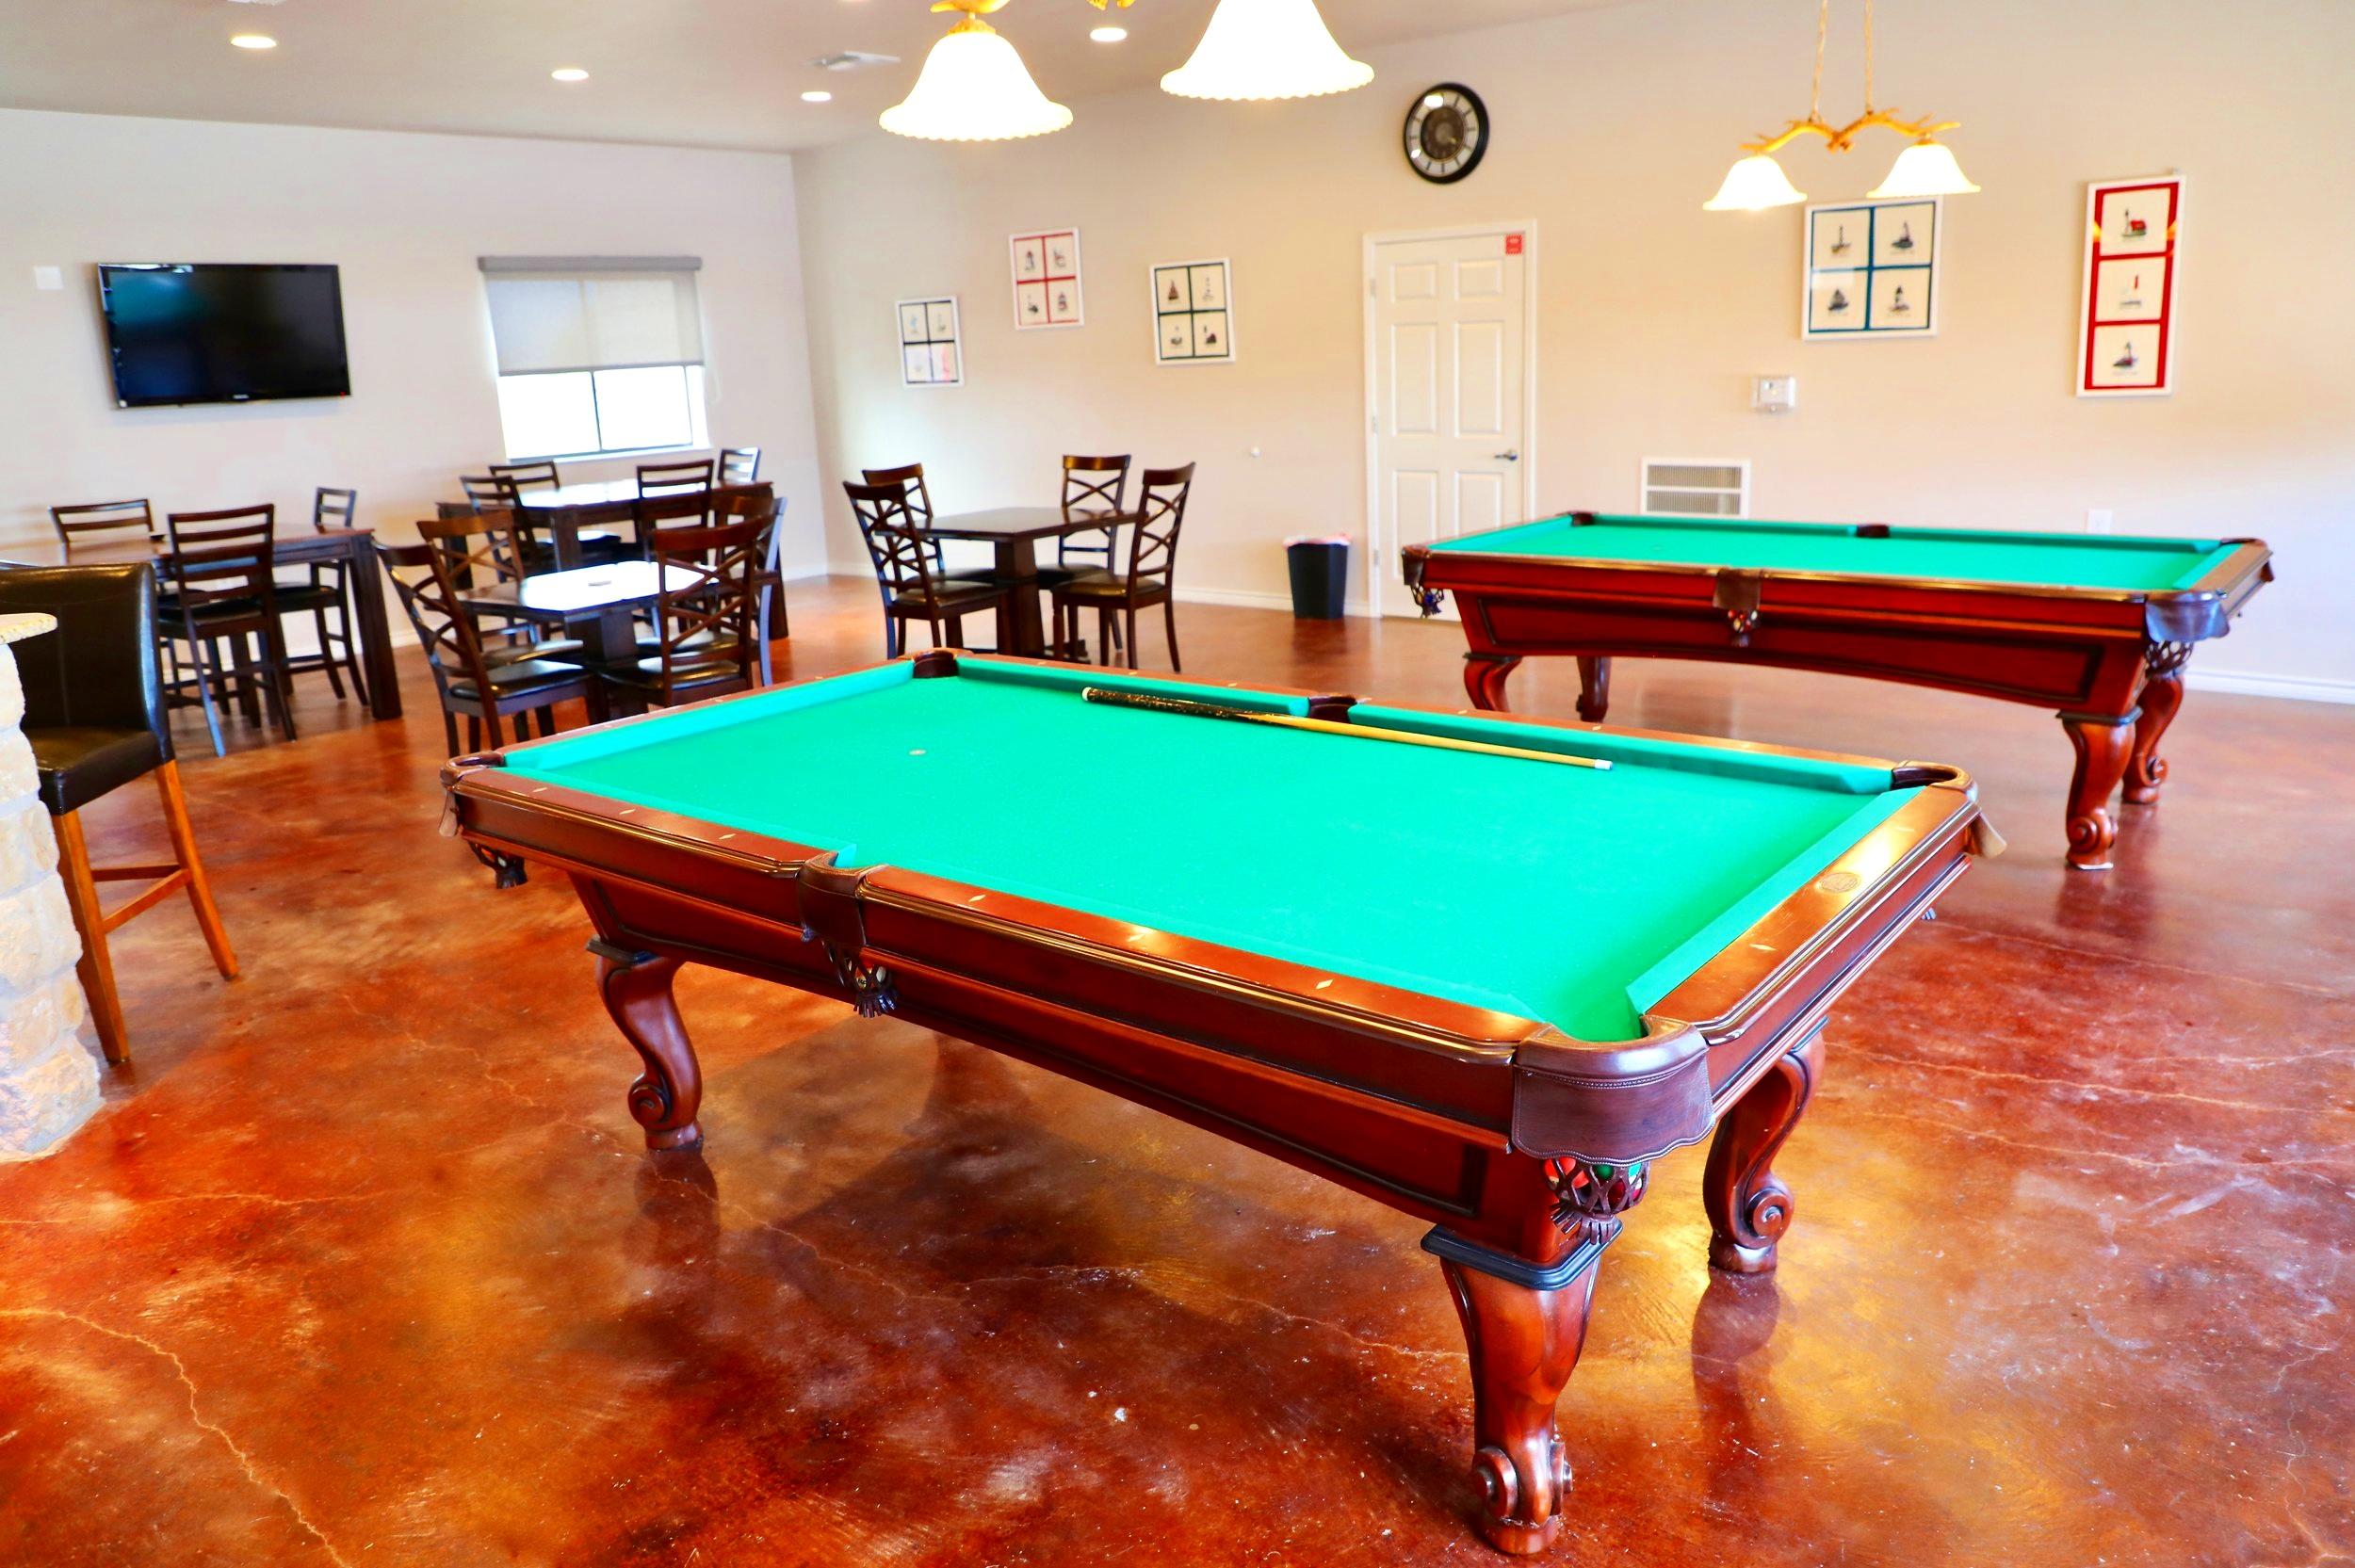 pool+table+bar+area.jpg